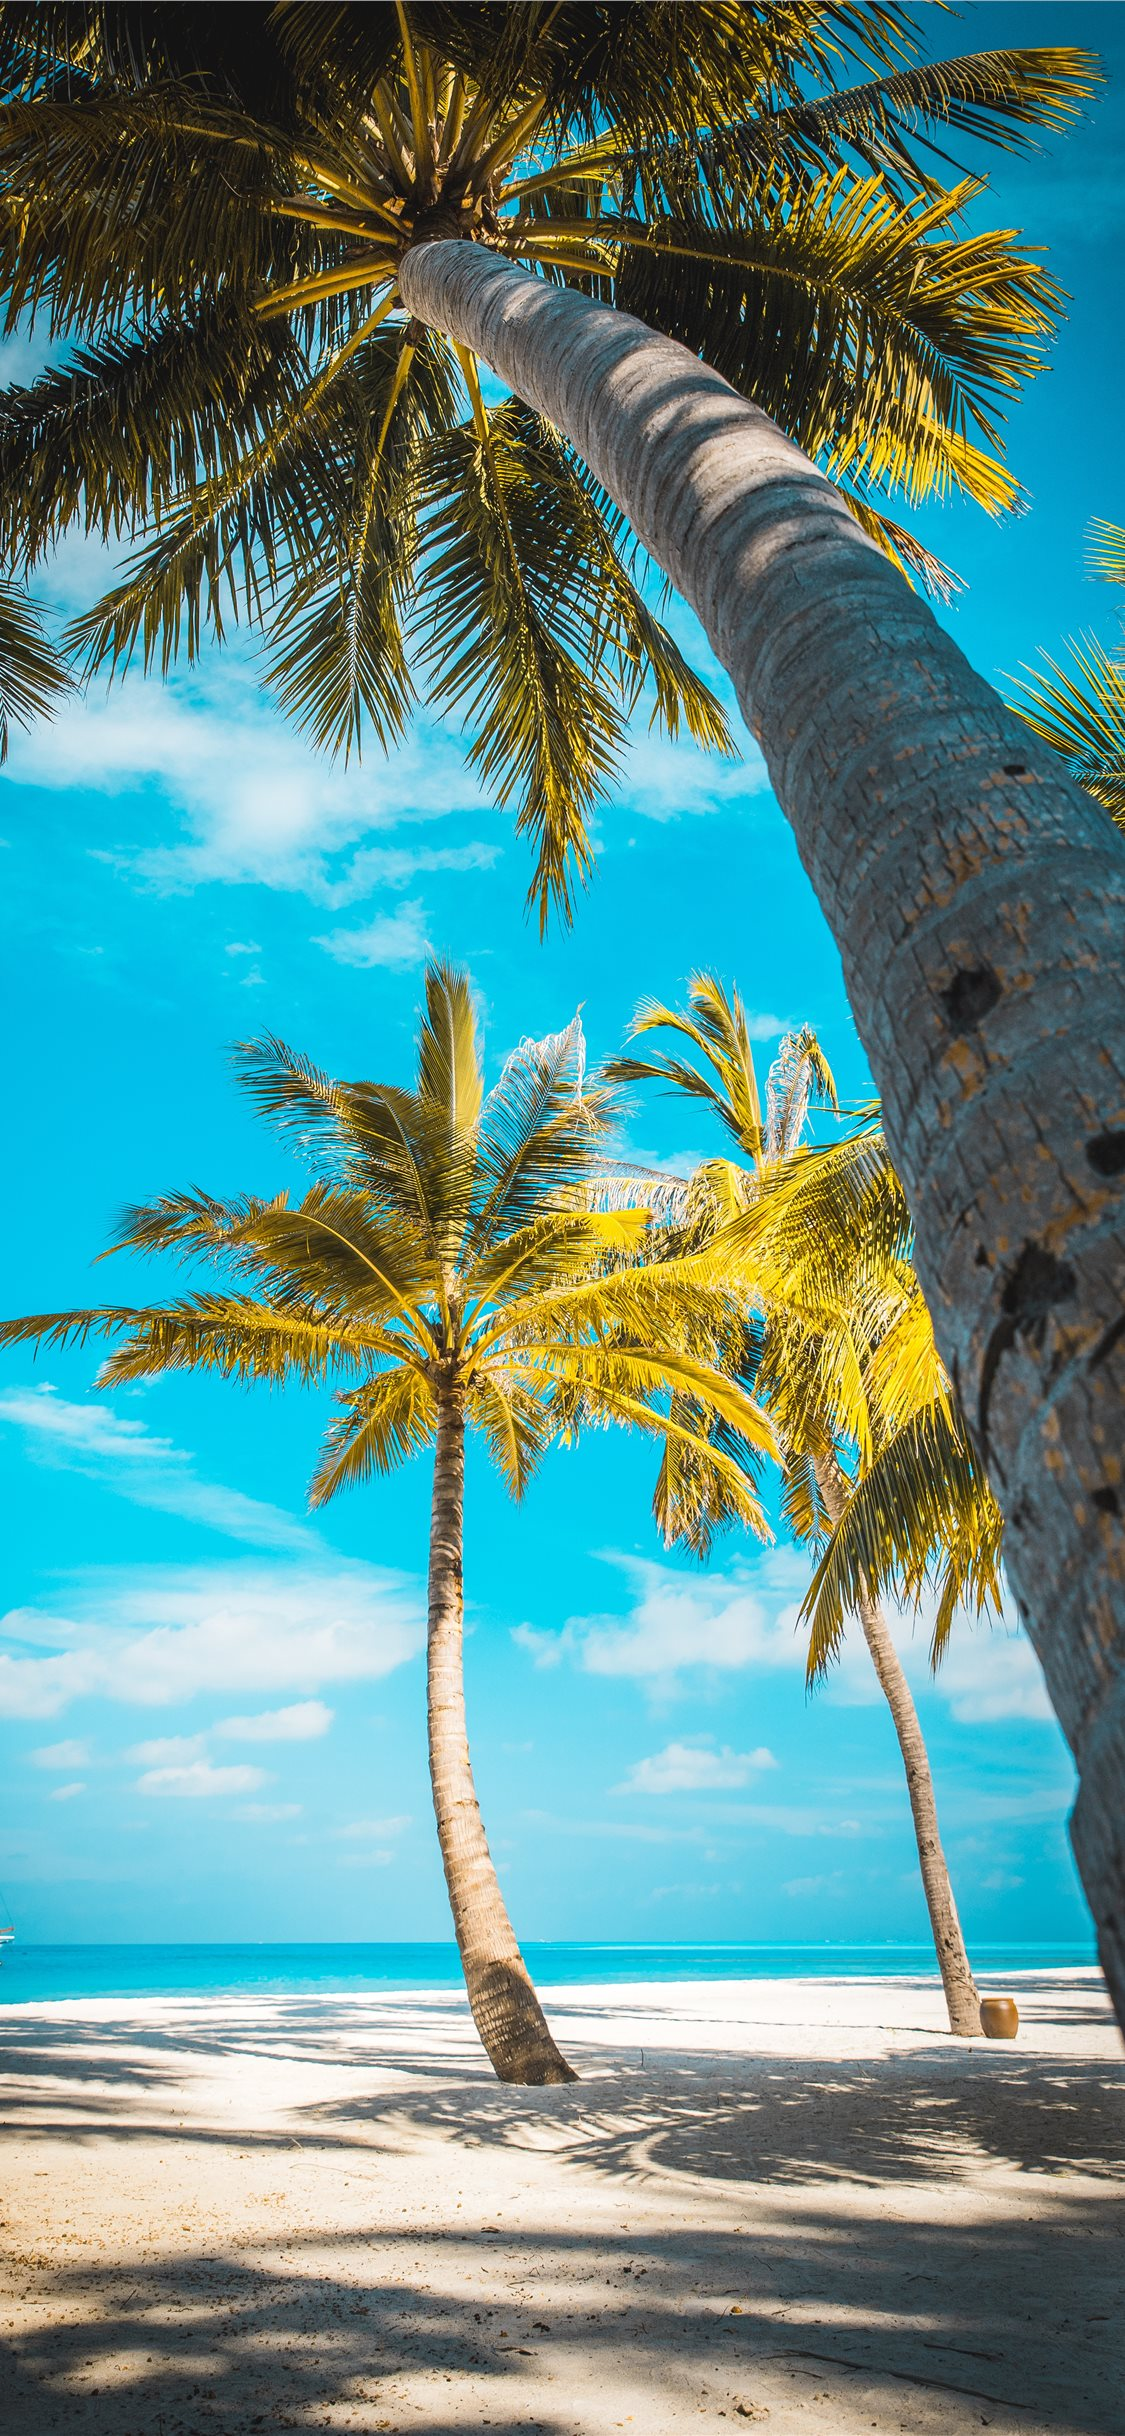 Best Summer iPhone X HD Wallpapers   iLikeWallpaper